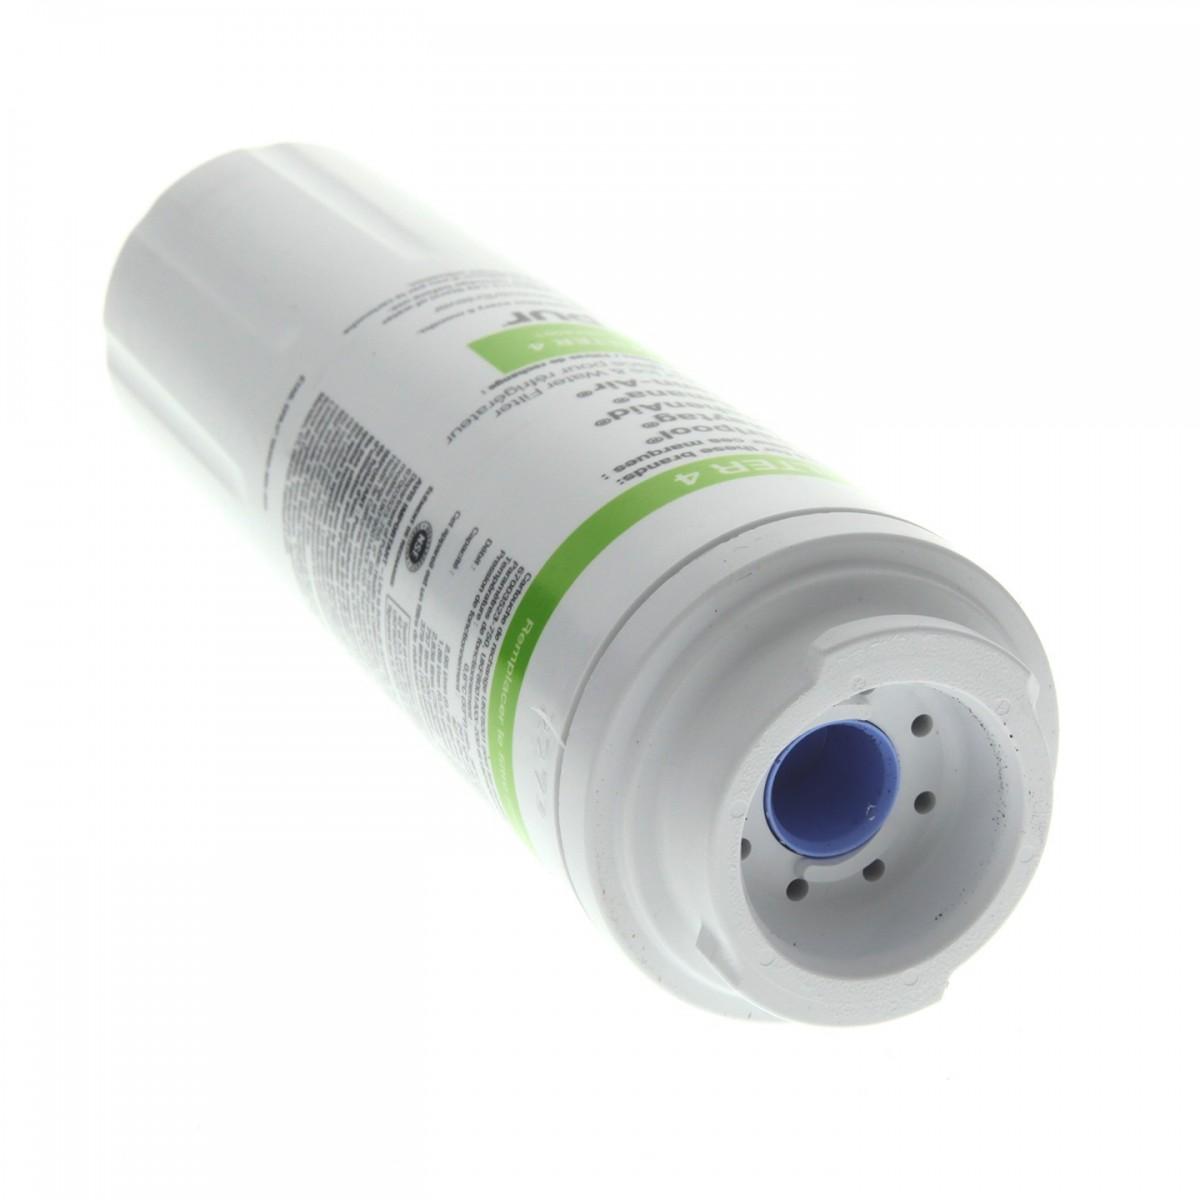 jenn air refrigerator water filter replacement instructions